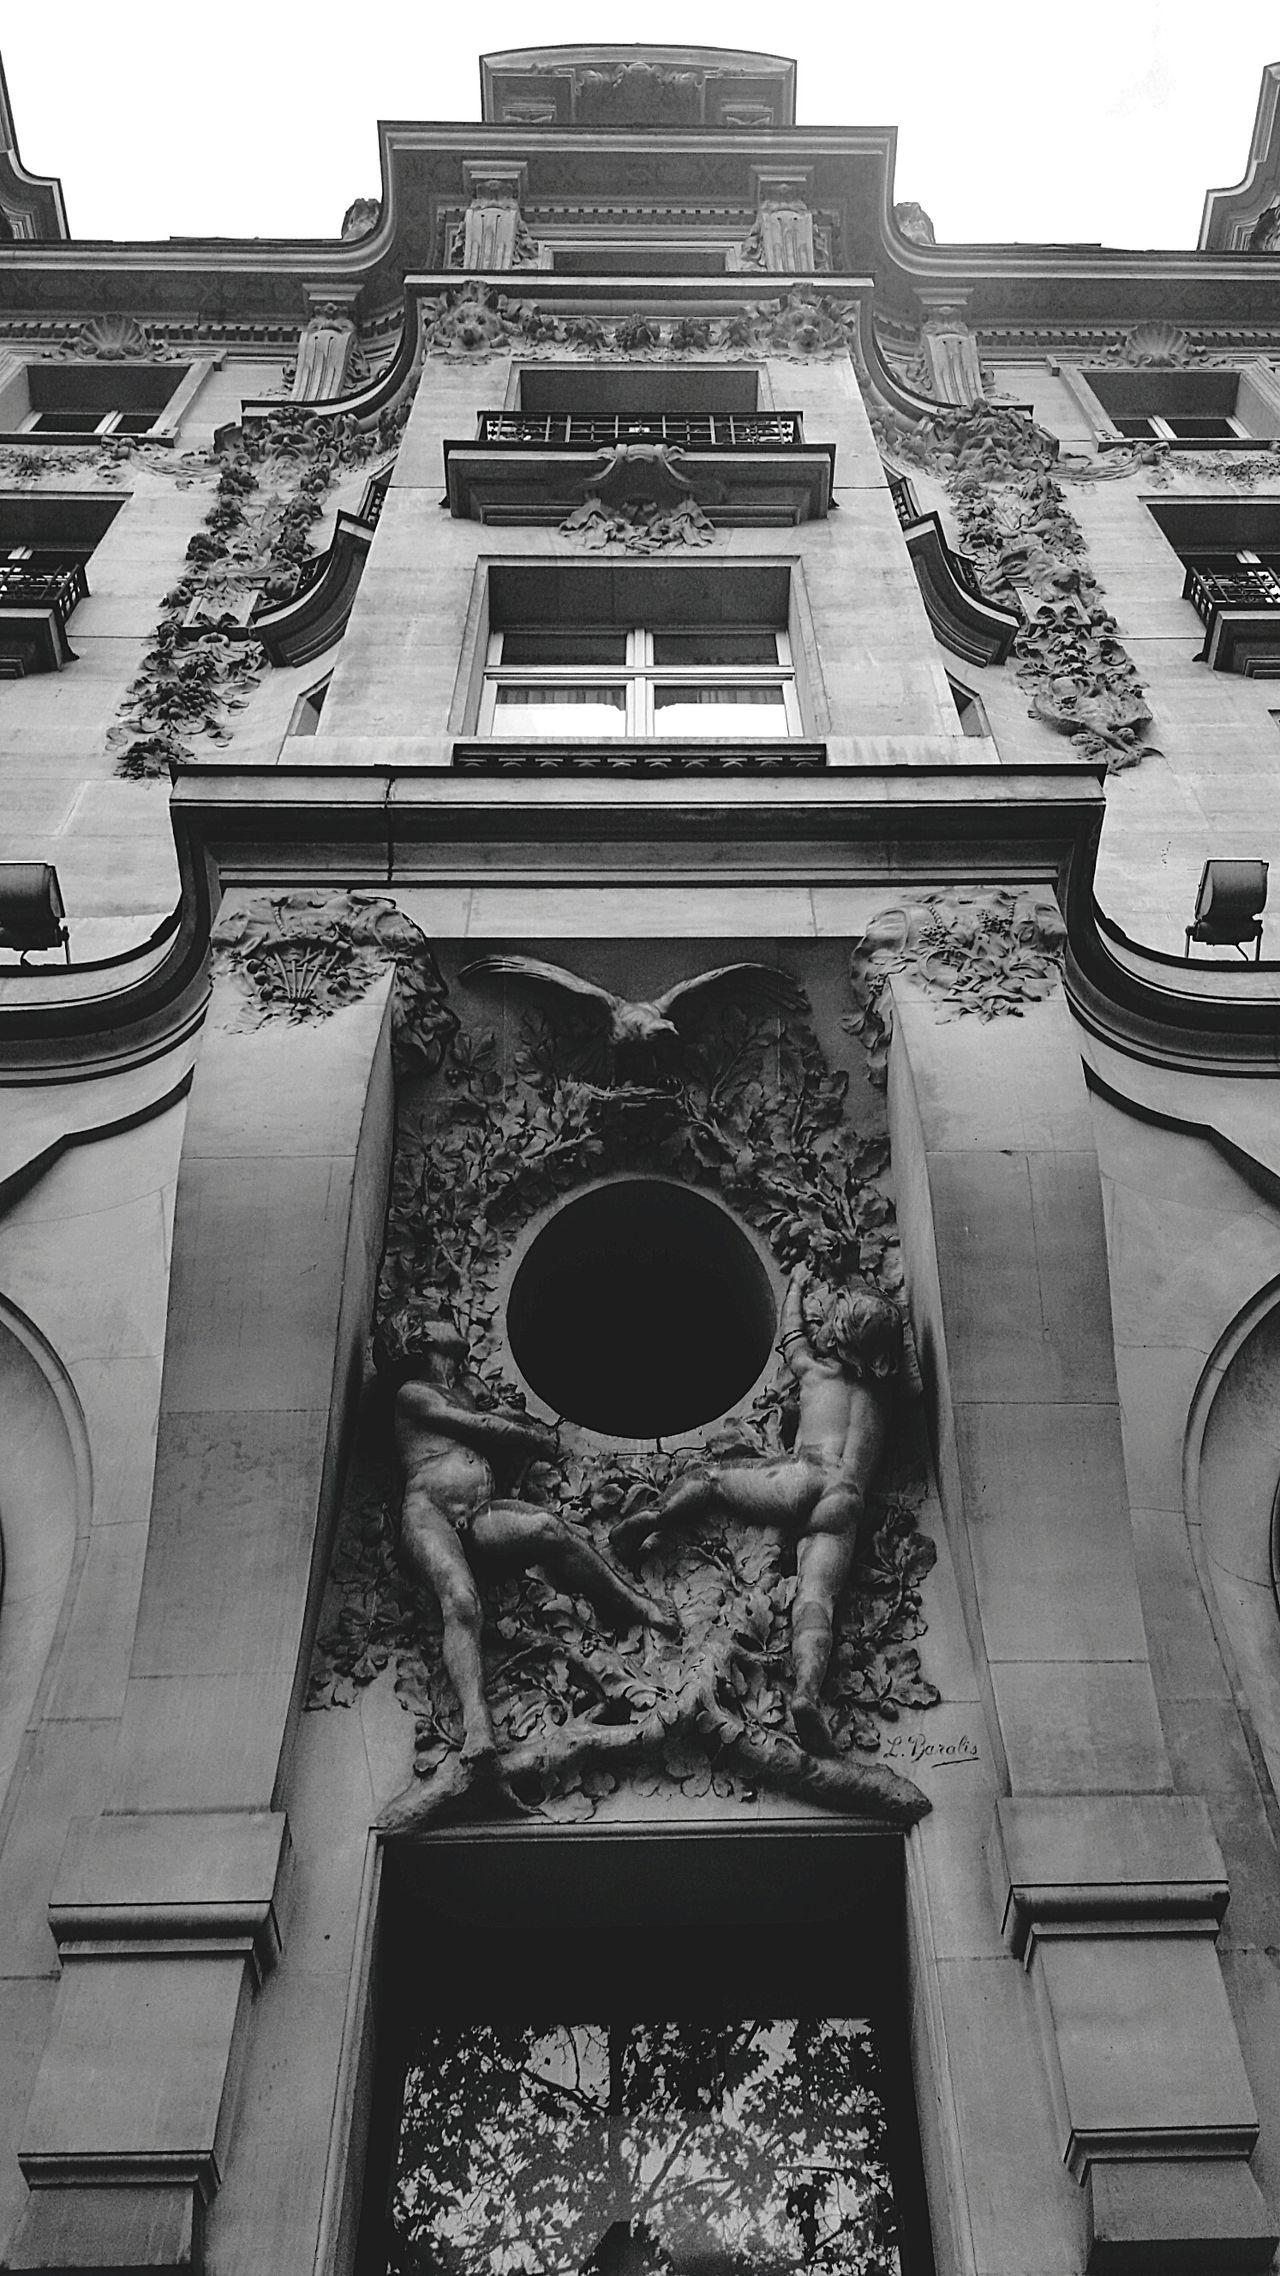 Oct 2016 Paris City Paris, France  Travel Destinations Architecture Travel Street French Streetphotography Built Structure Wanderlust Samsungphotography Samsung Galaxy S6 Edge Champs-Élysées  No People Building Exterior Building